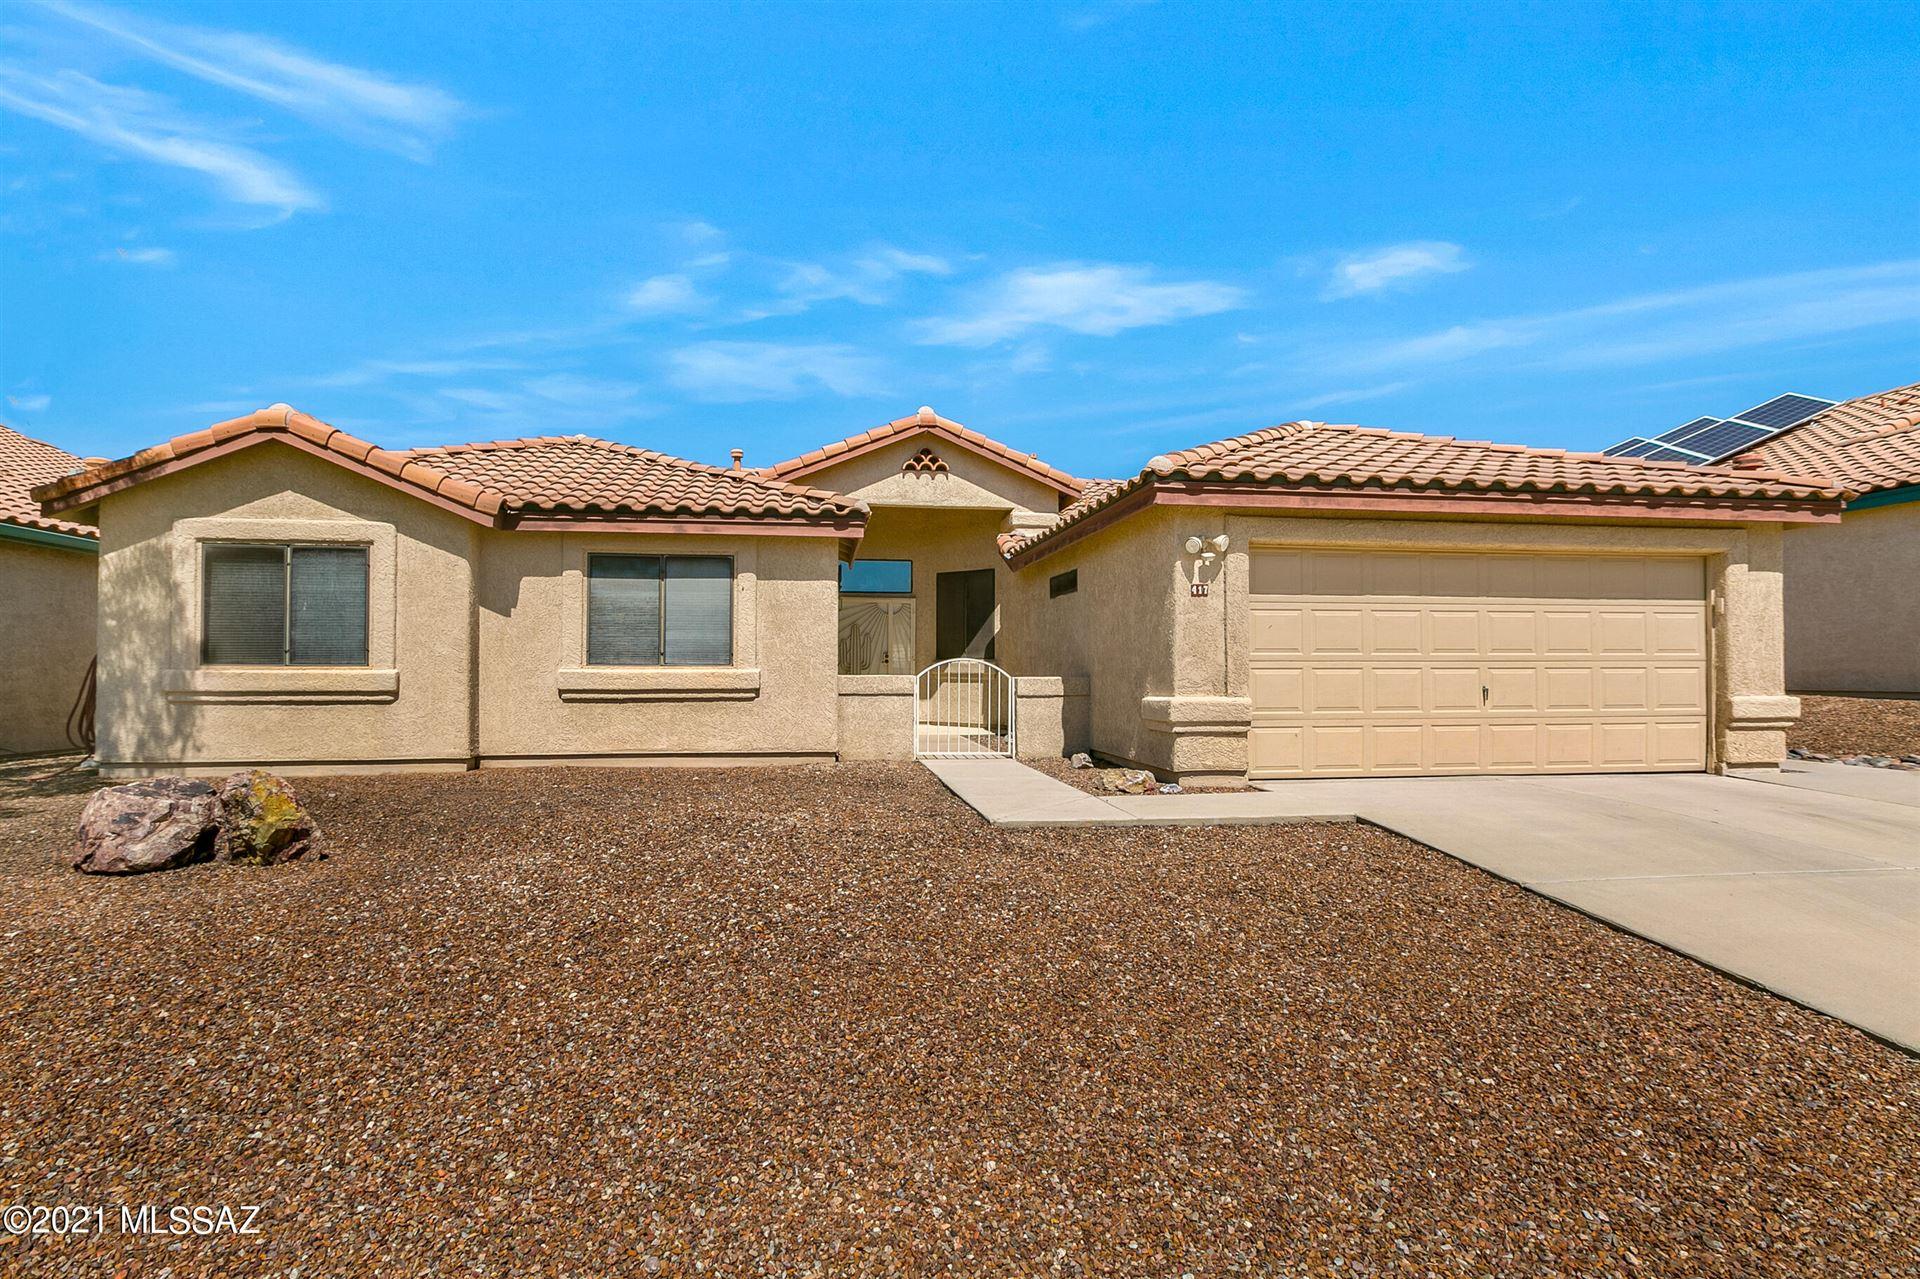 417 N Sedge Lane, Tucson, AZ 85748 - MLS#: 22124562